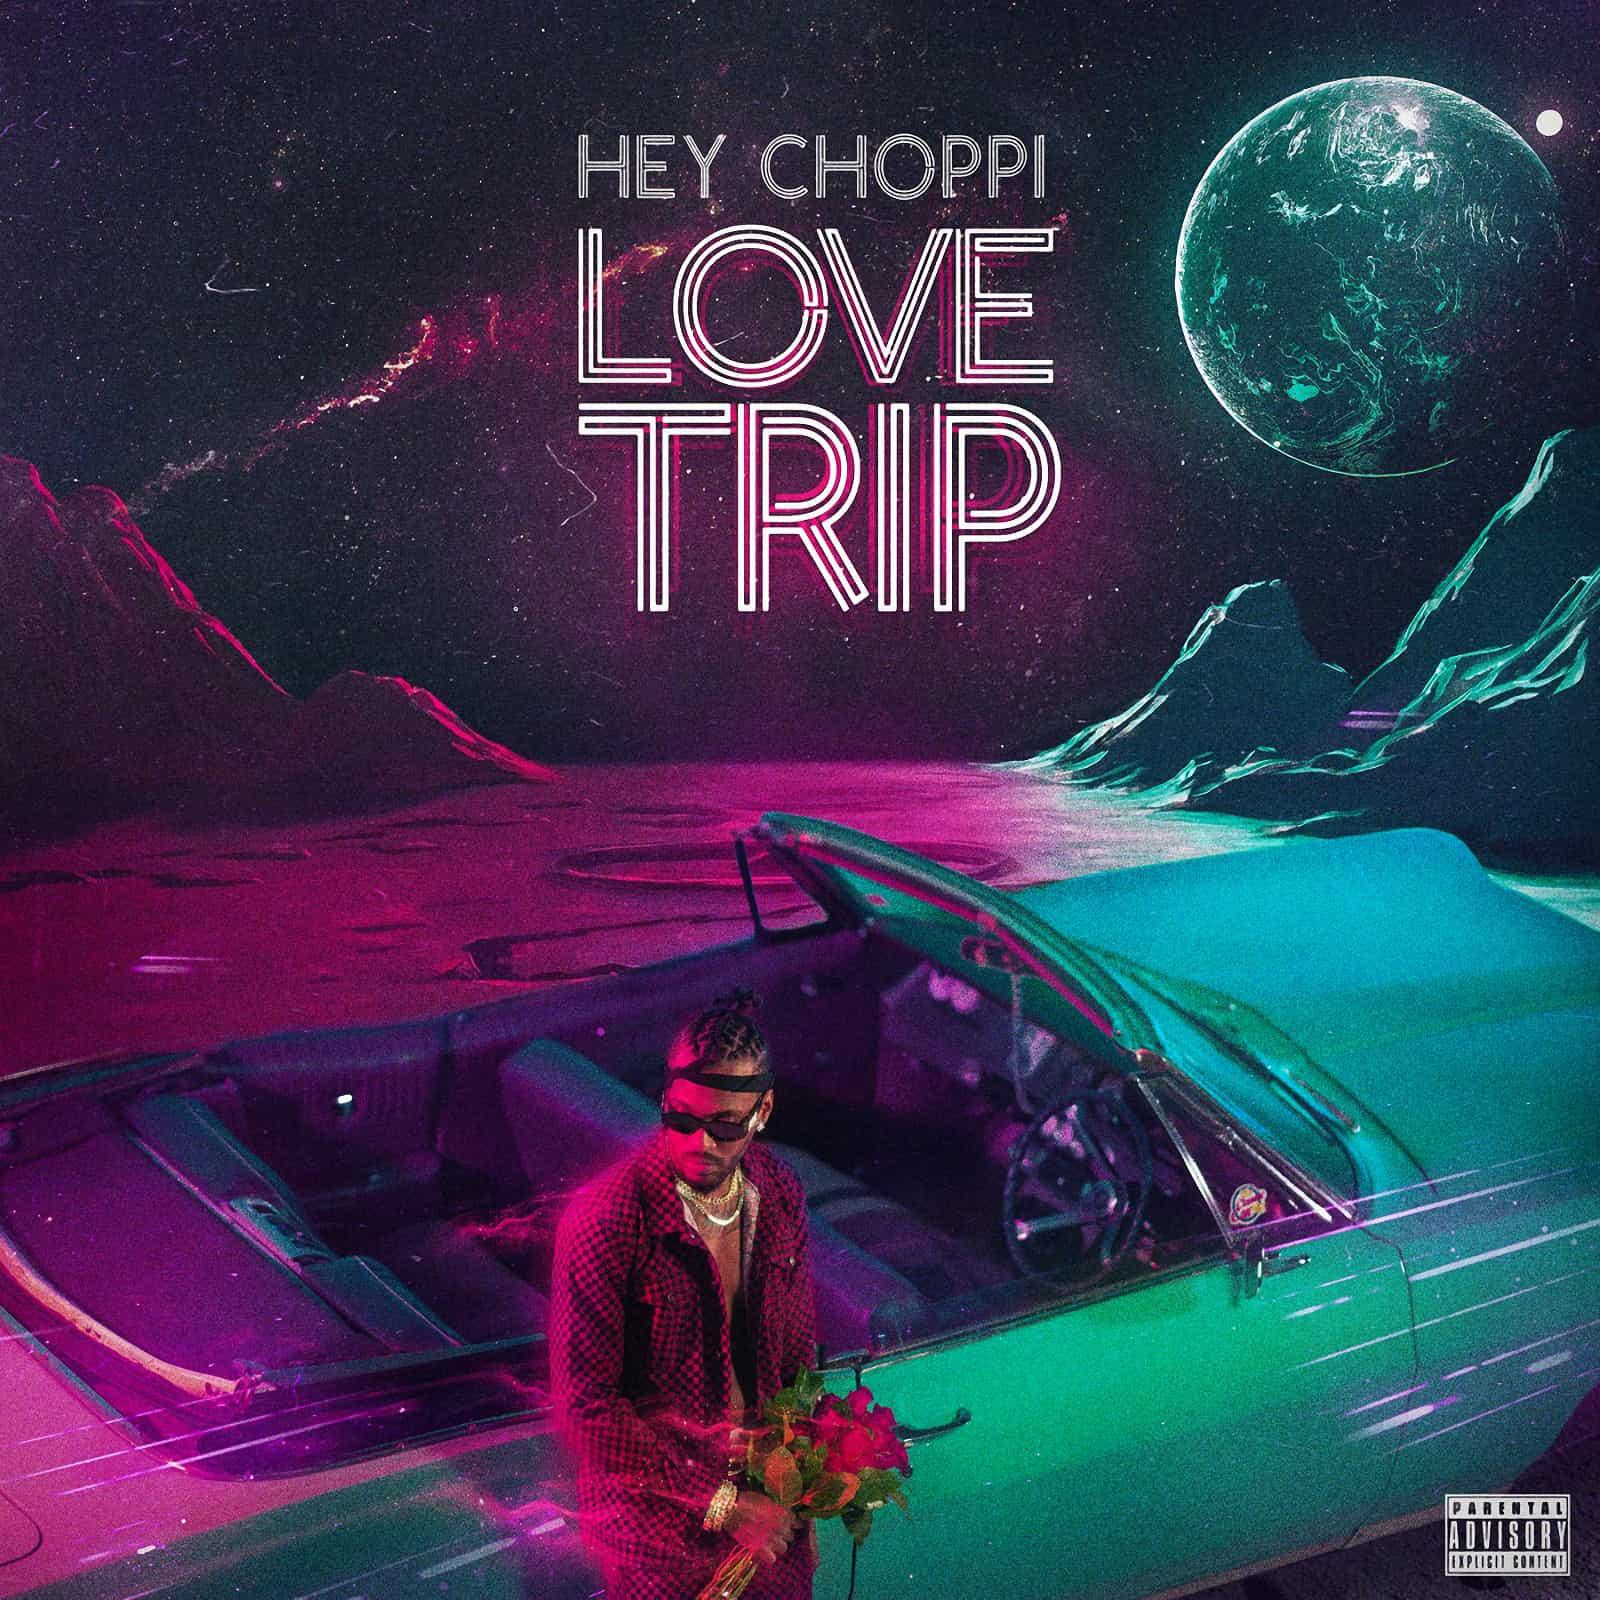 Hey Choppi - Love Trip EP - Alienation Muzik / Monk Music